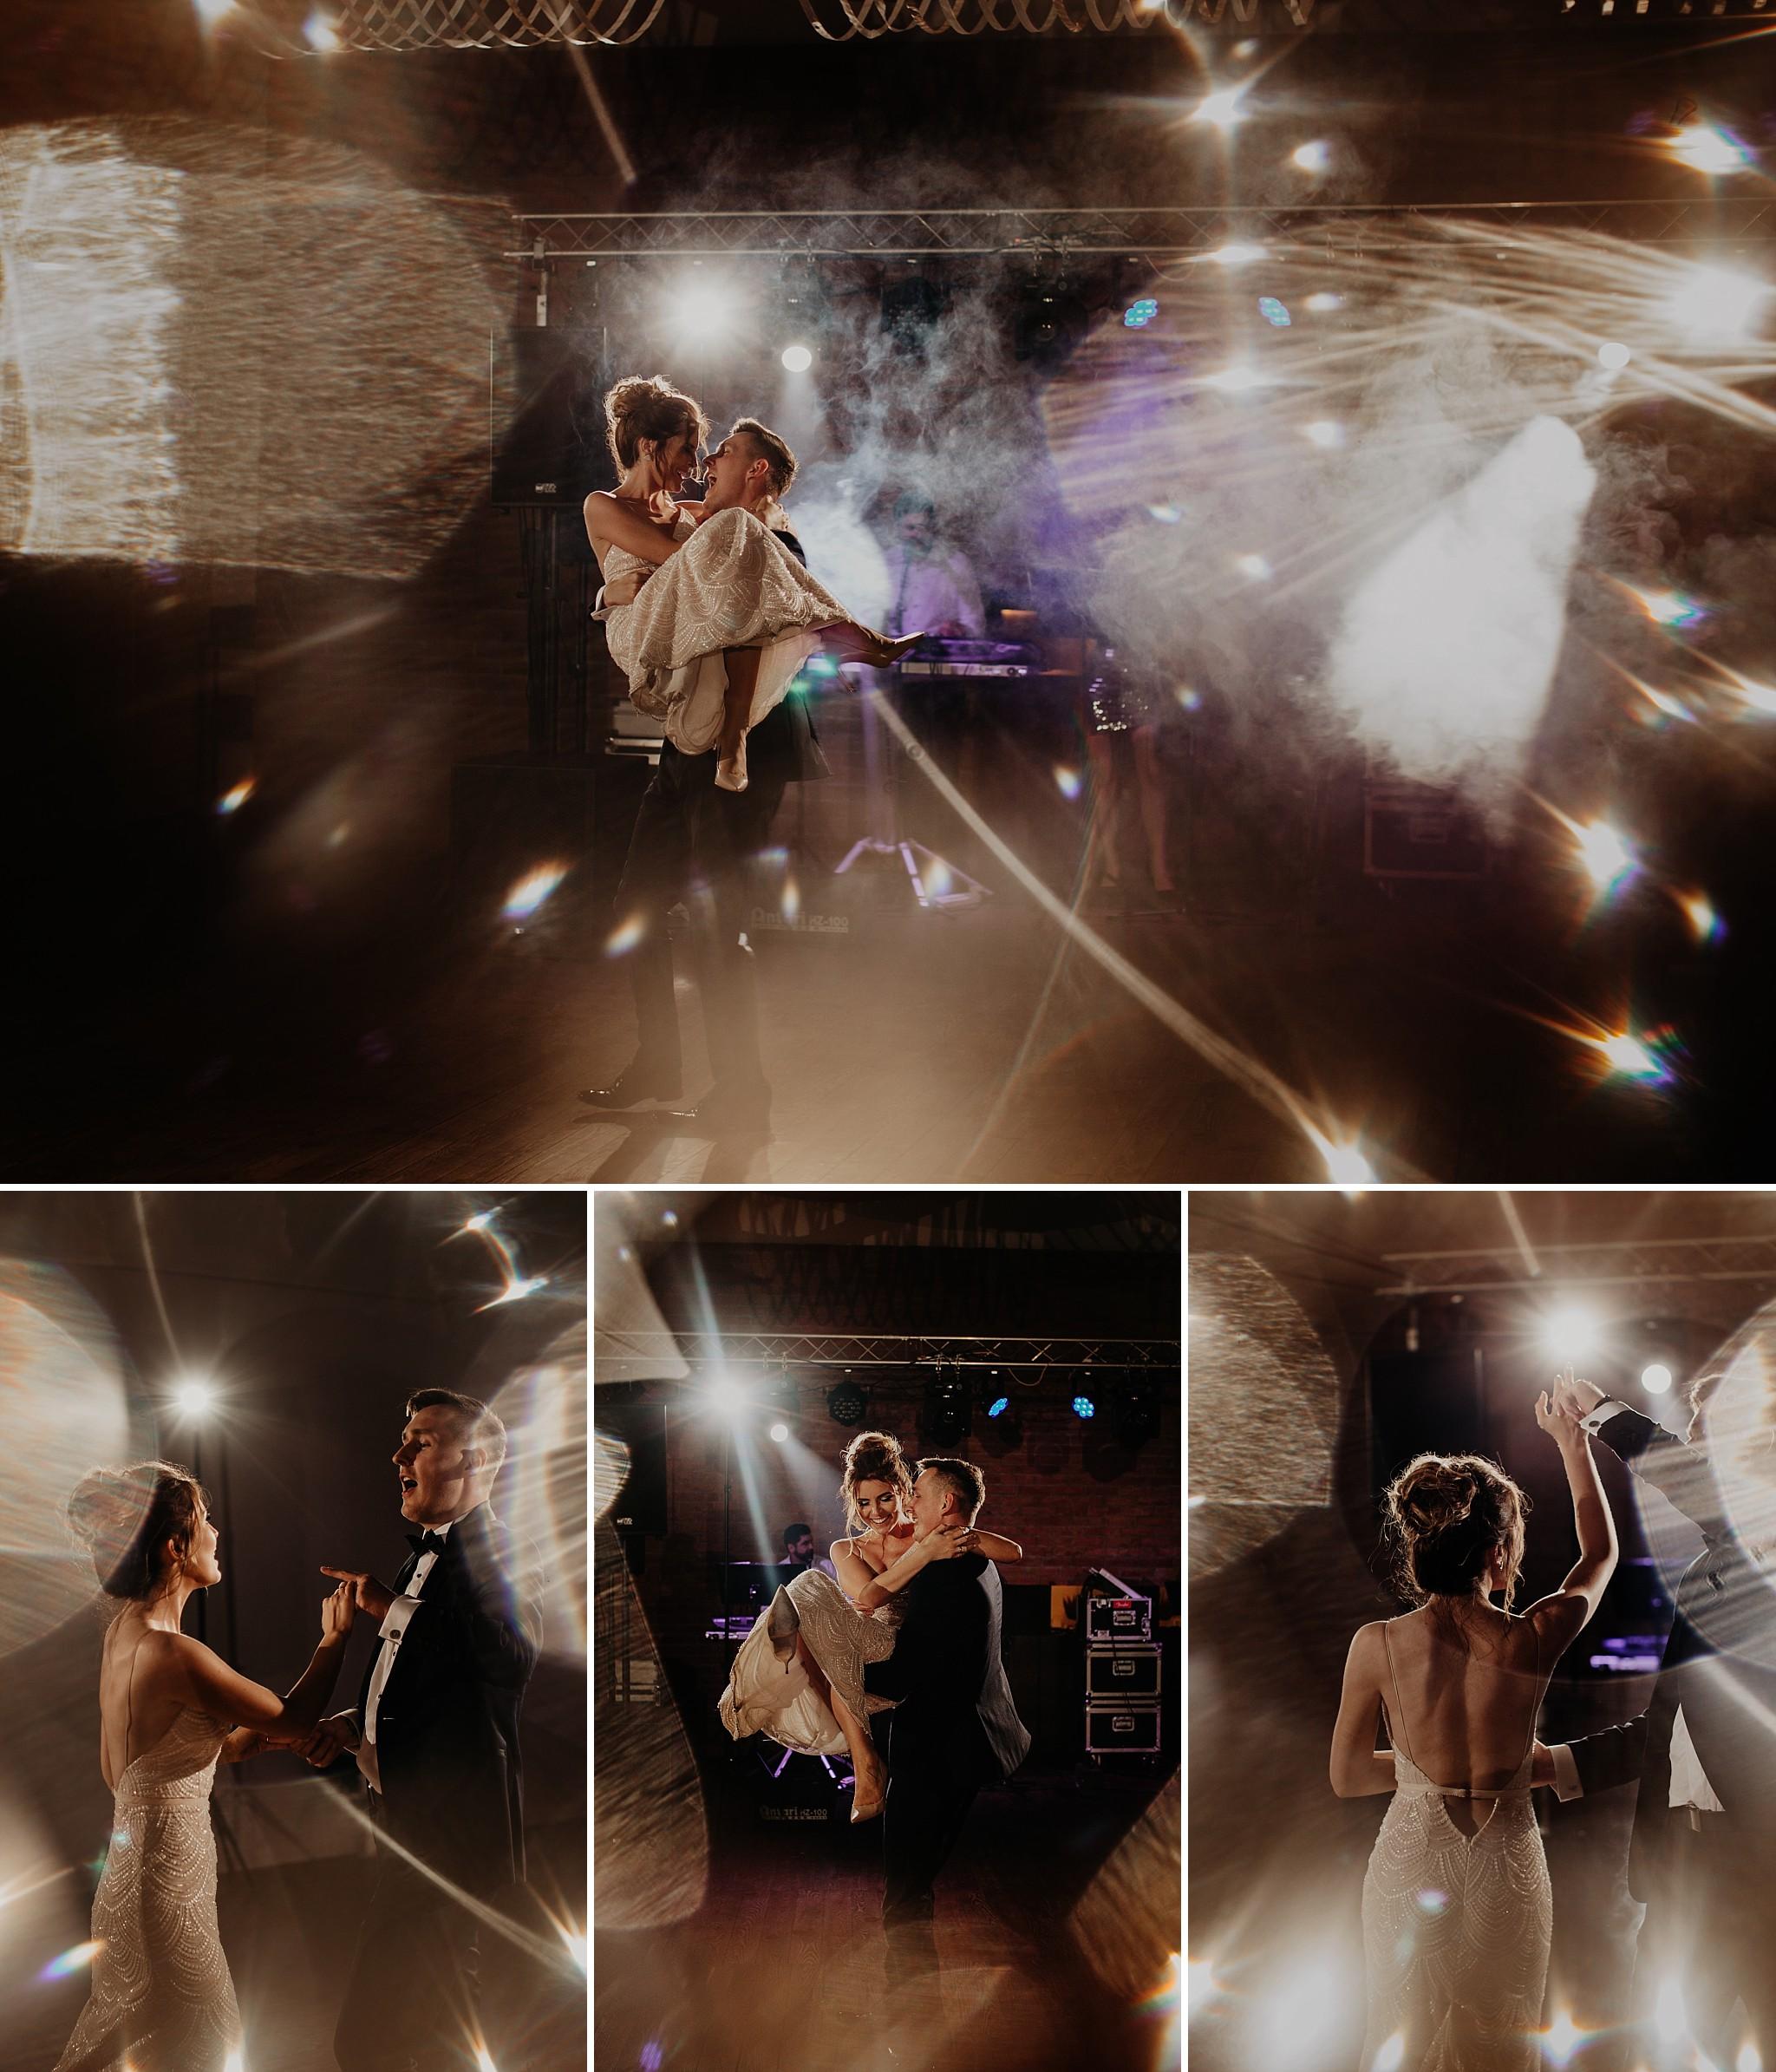 fotograf poznan wesele dobra truskawka piekne wesele pod poznaniem wesele w dobrej truskawce piekna para mloda slub marzen slub koronawirus slub listopad wesele koronawirus 512